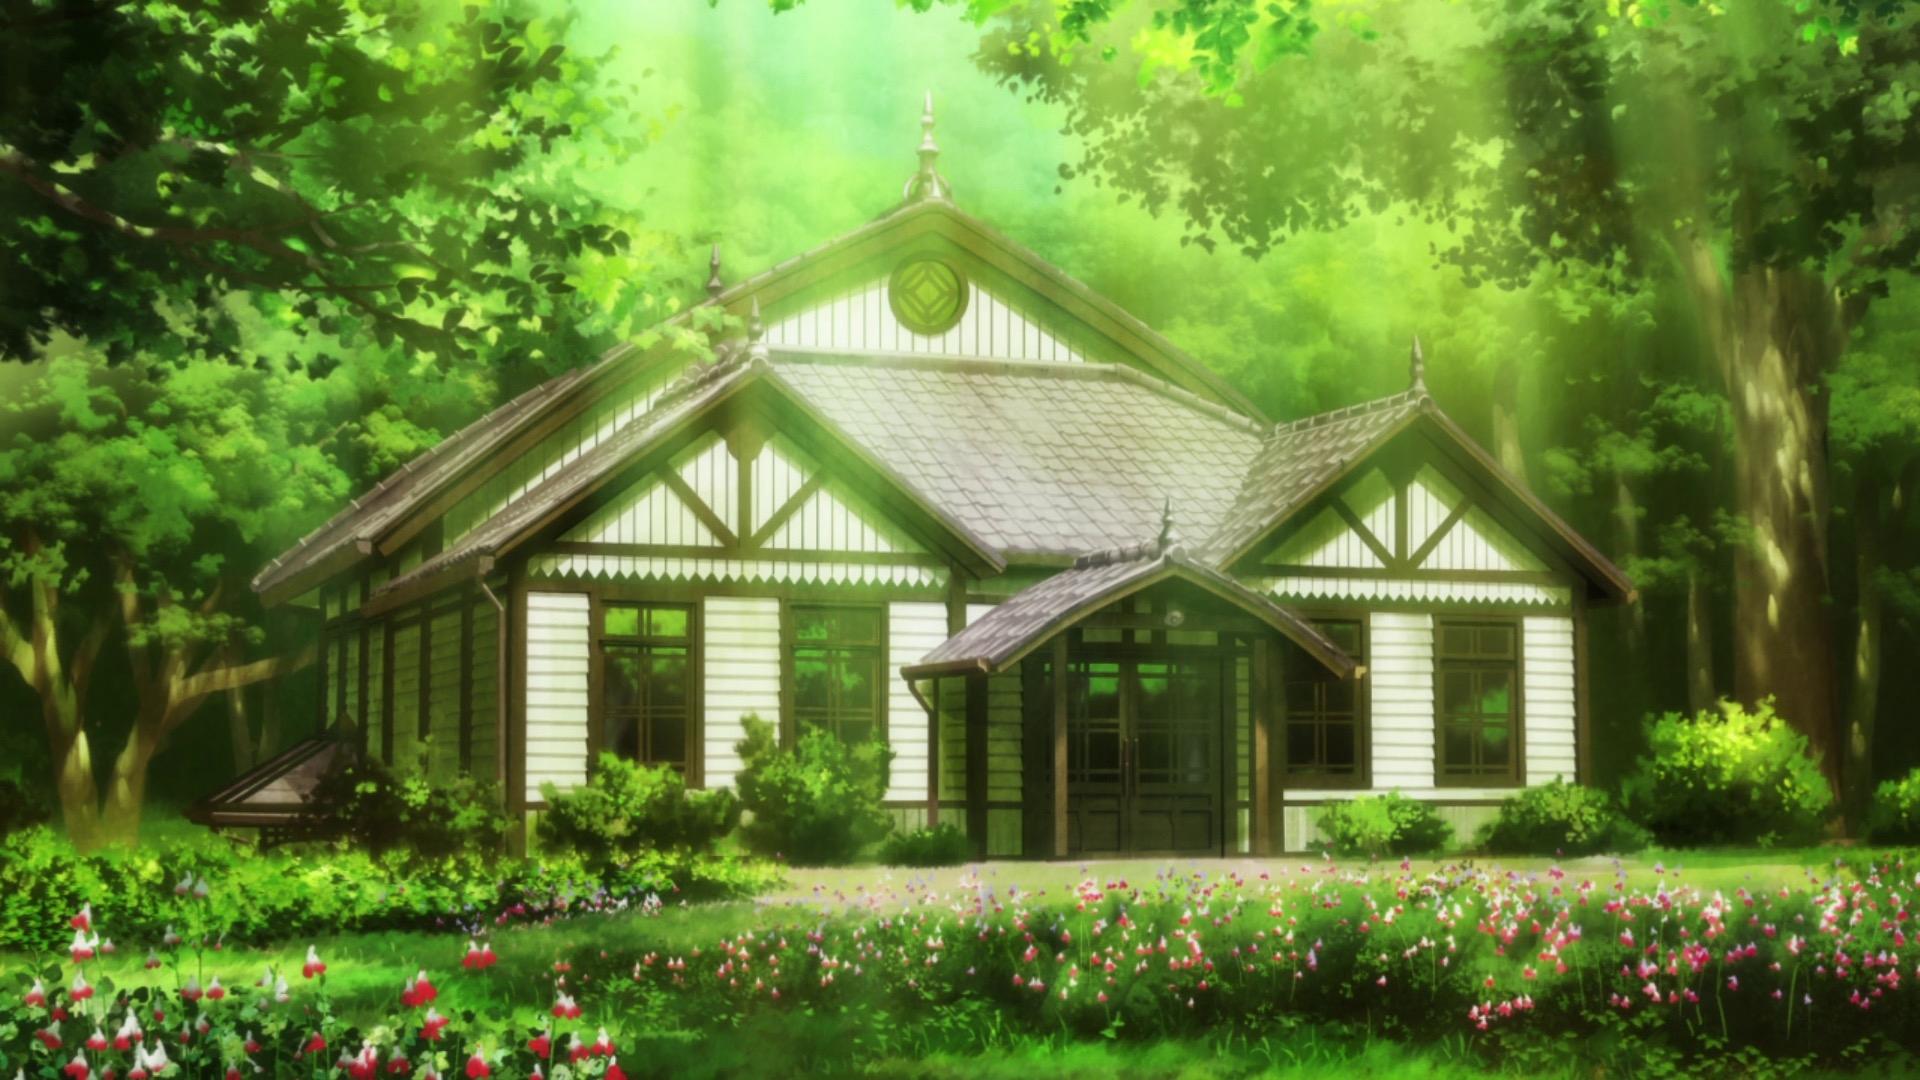 Lavijeva kuca 2353601-1920x1080-Mahoutsukai-OVA-01-74